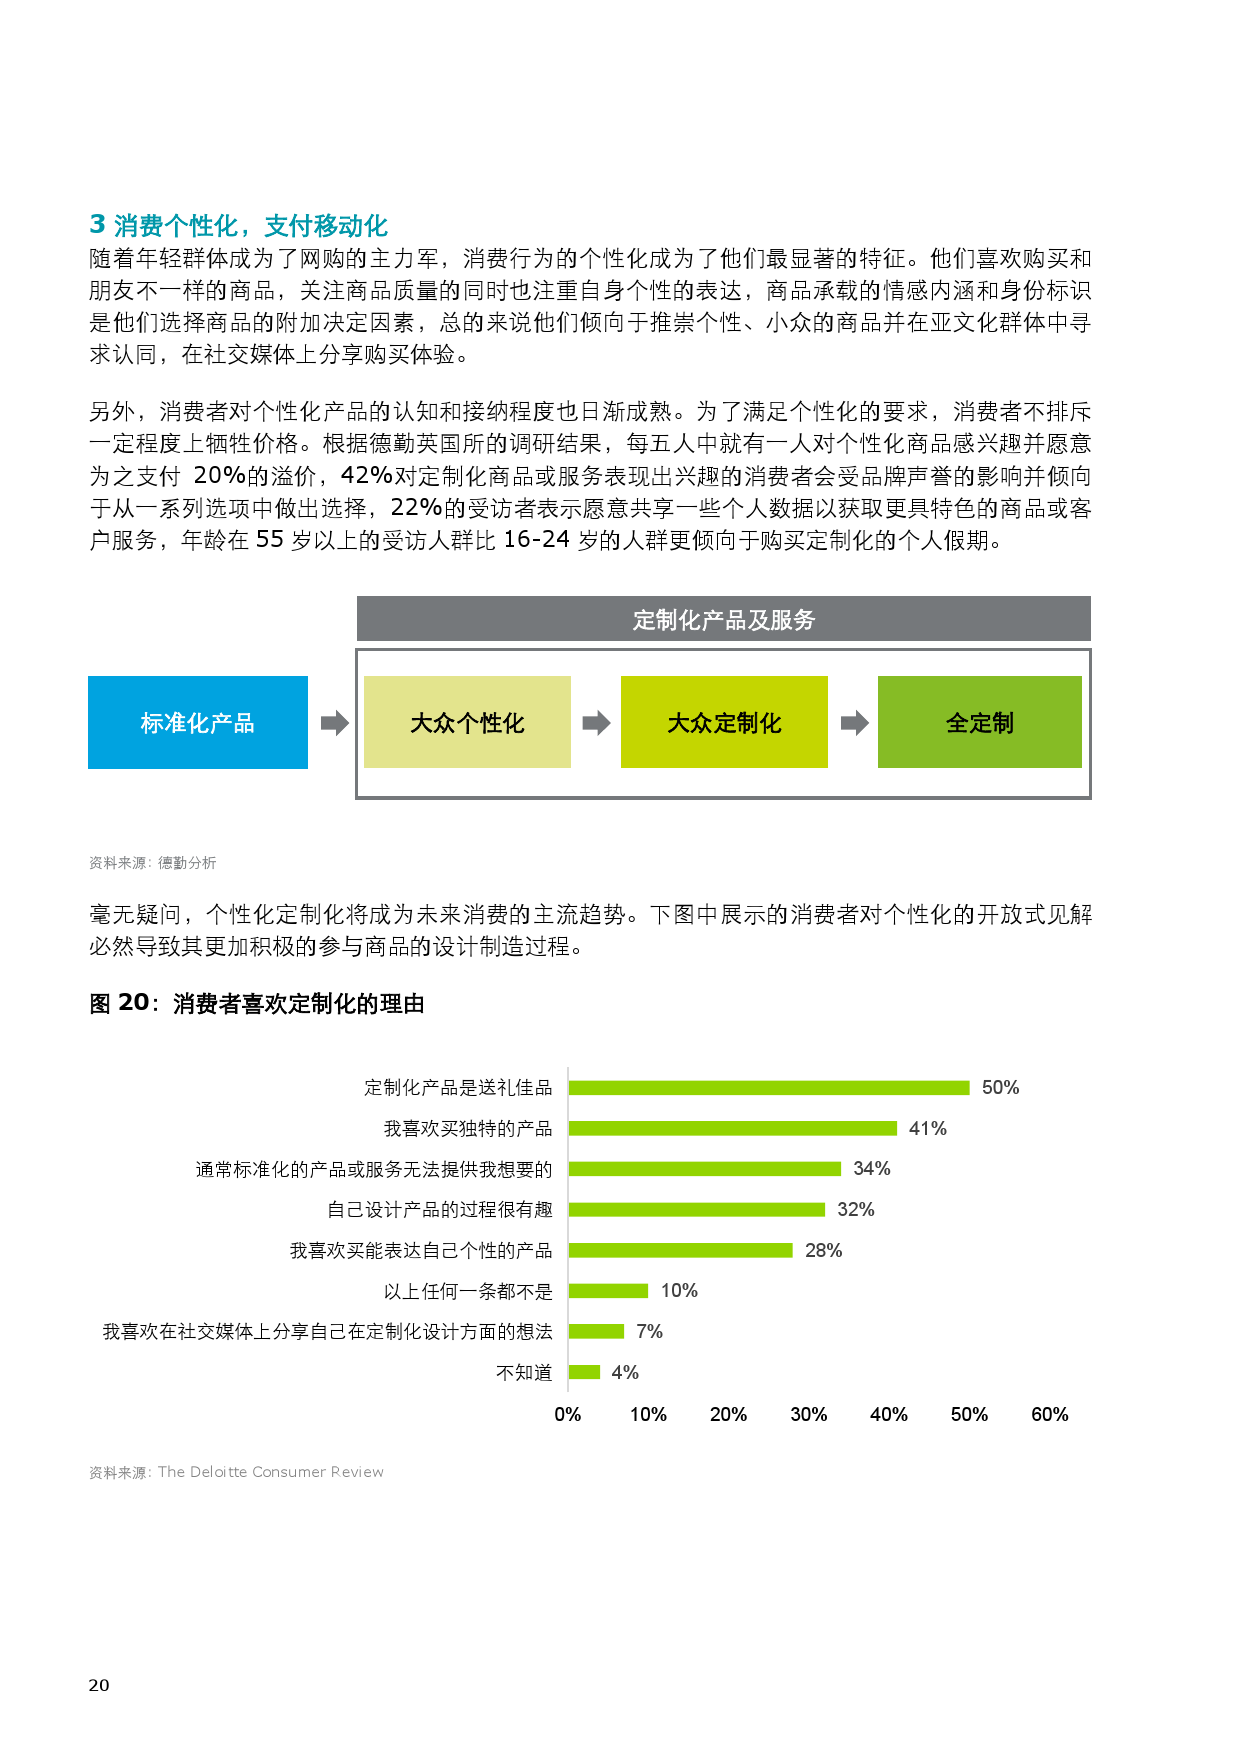 2016%e4%b8%ad%e5%9b%bd%e7%bd%91%e7%bb%9c%e9%9b%b6%e5%94%ae%e5%b8%82%e5%9c%ba%e5%8f%91%e5%b1%95%e7%a0%94%e7%a9%b6%e6%8a%a5%e5%91%8a_000024